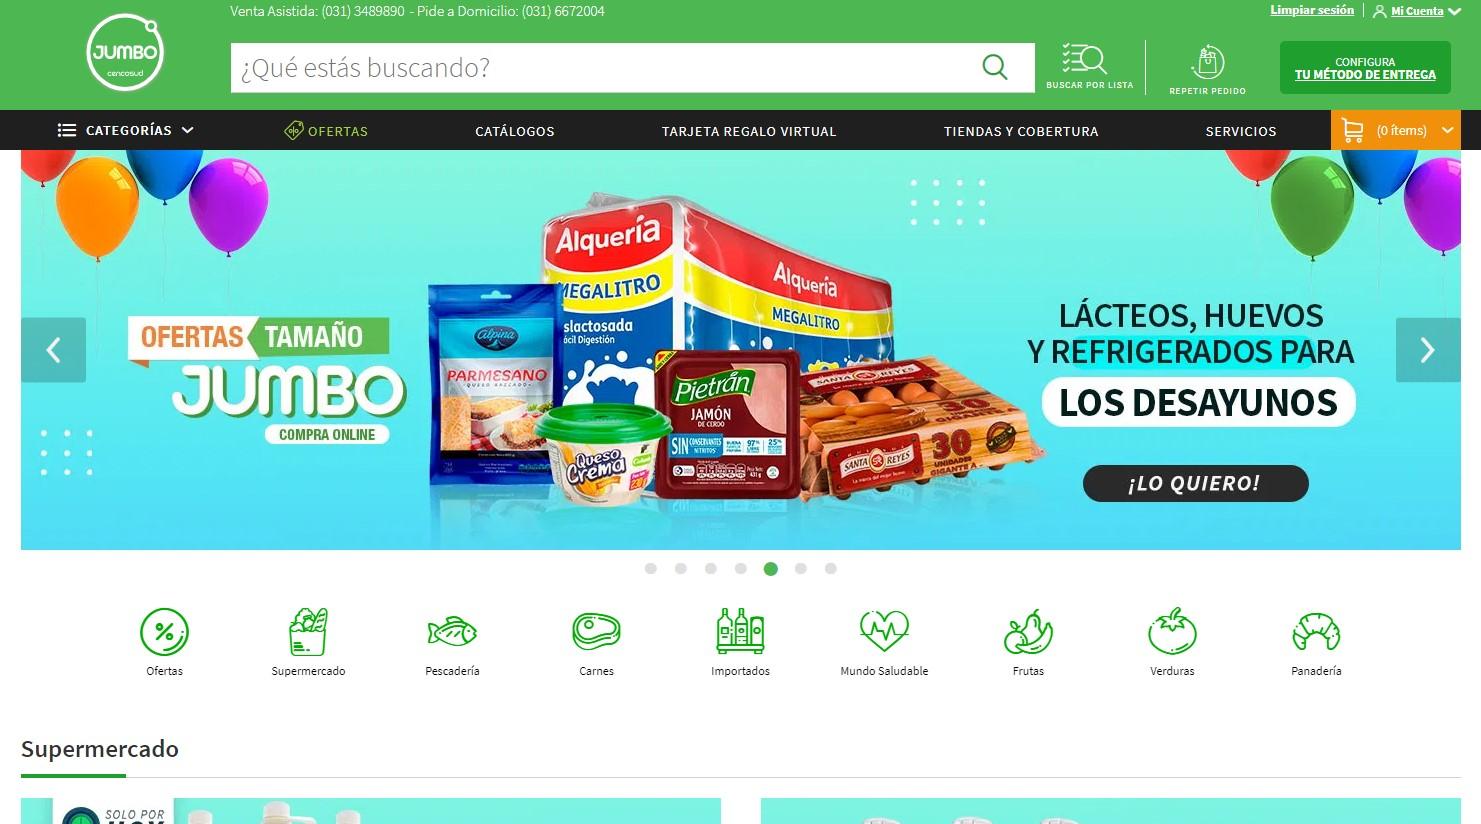 Ejemplos B2C de e-commerce exitosos de Retail en Colombia 2021: Jumbo - Cencosud